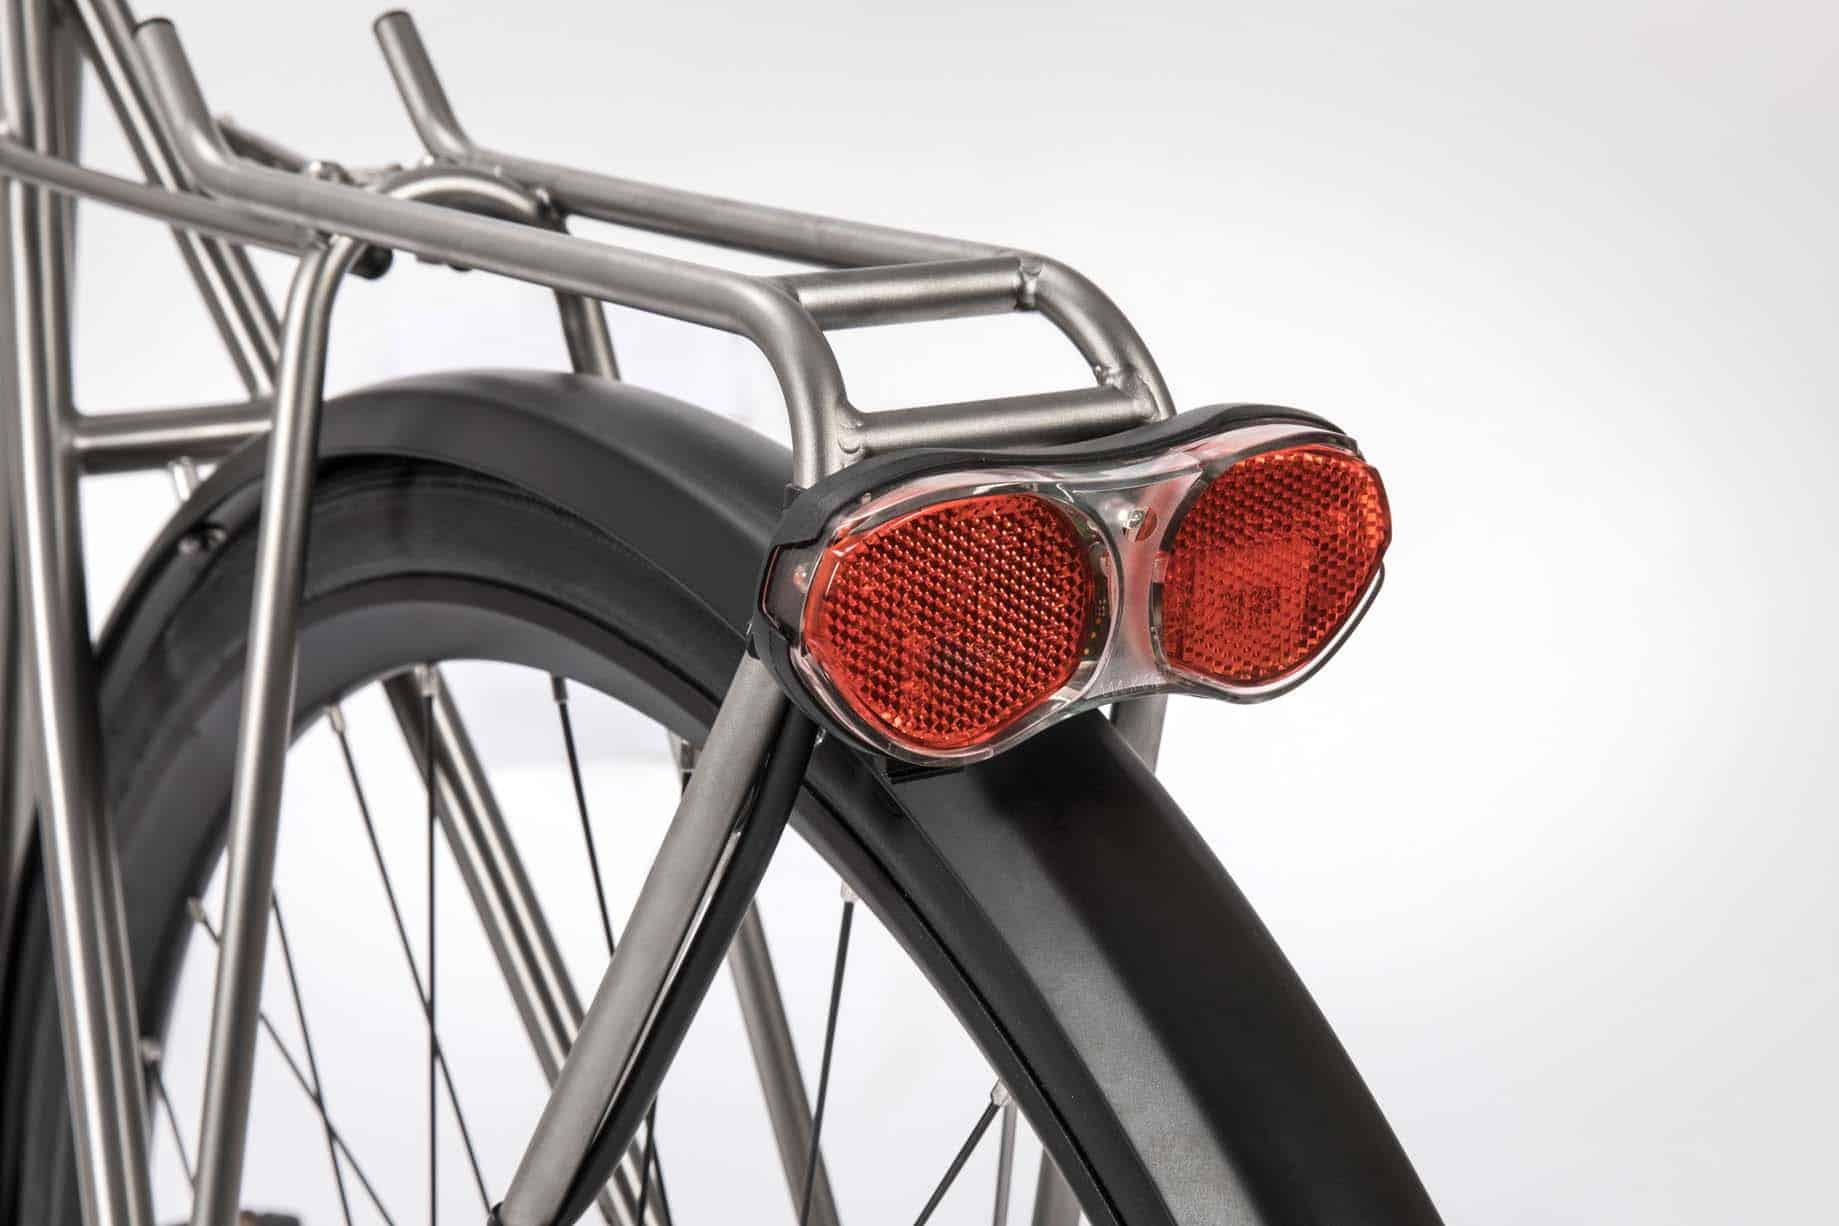 Urban_Pinion_Bike_06_min